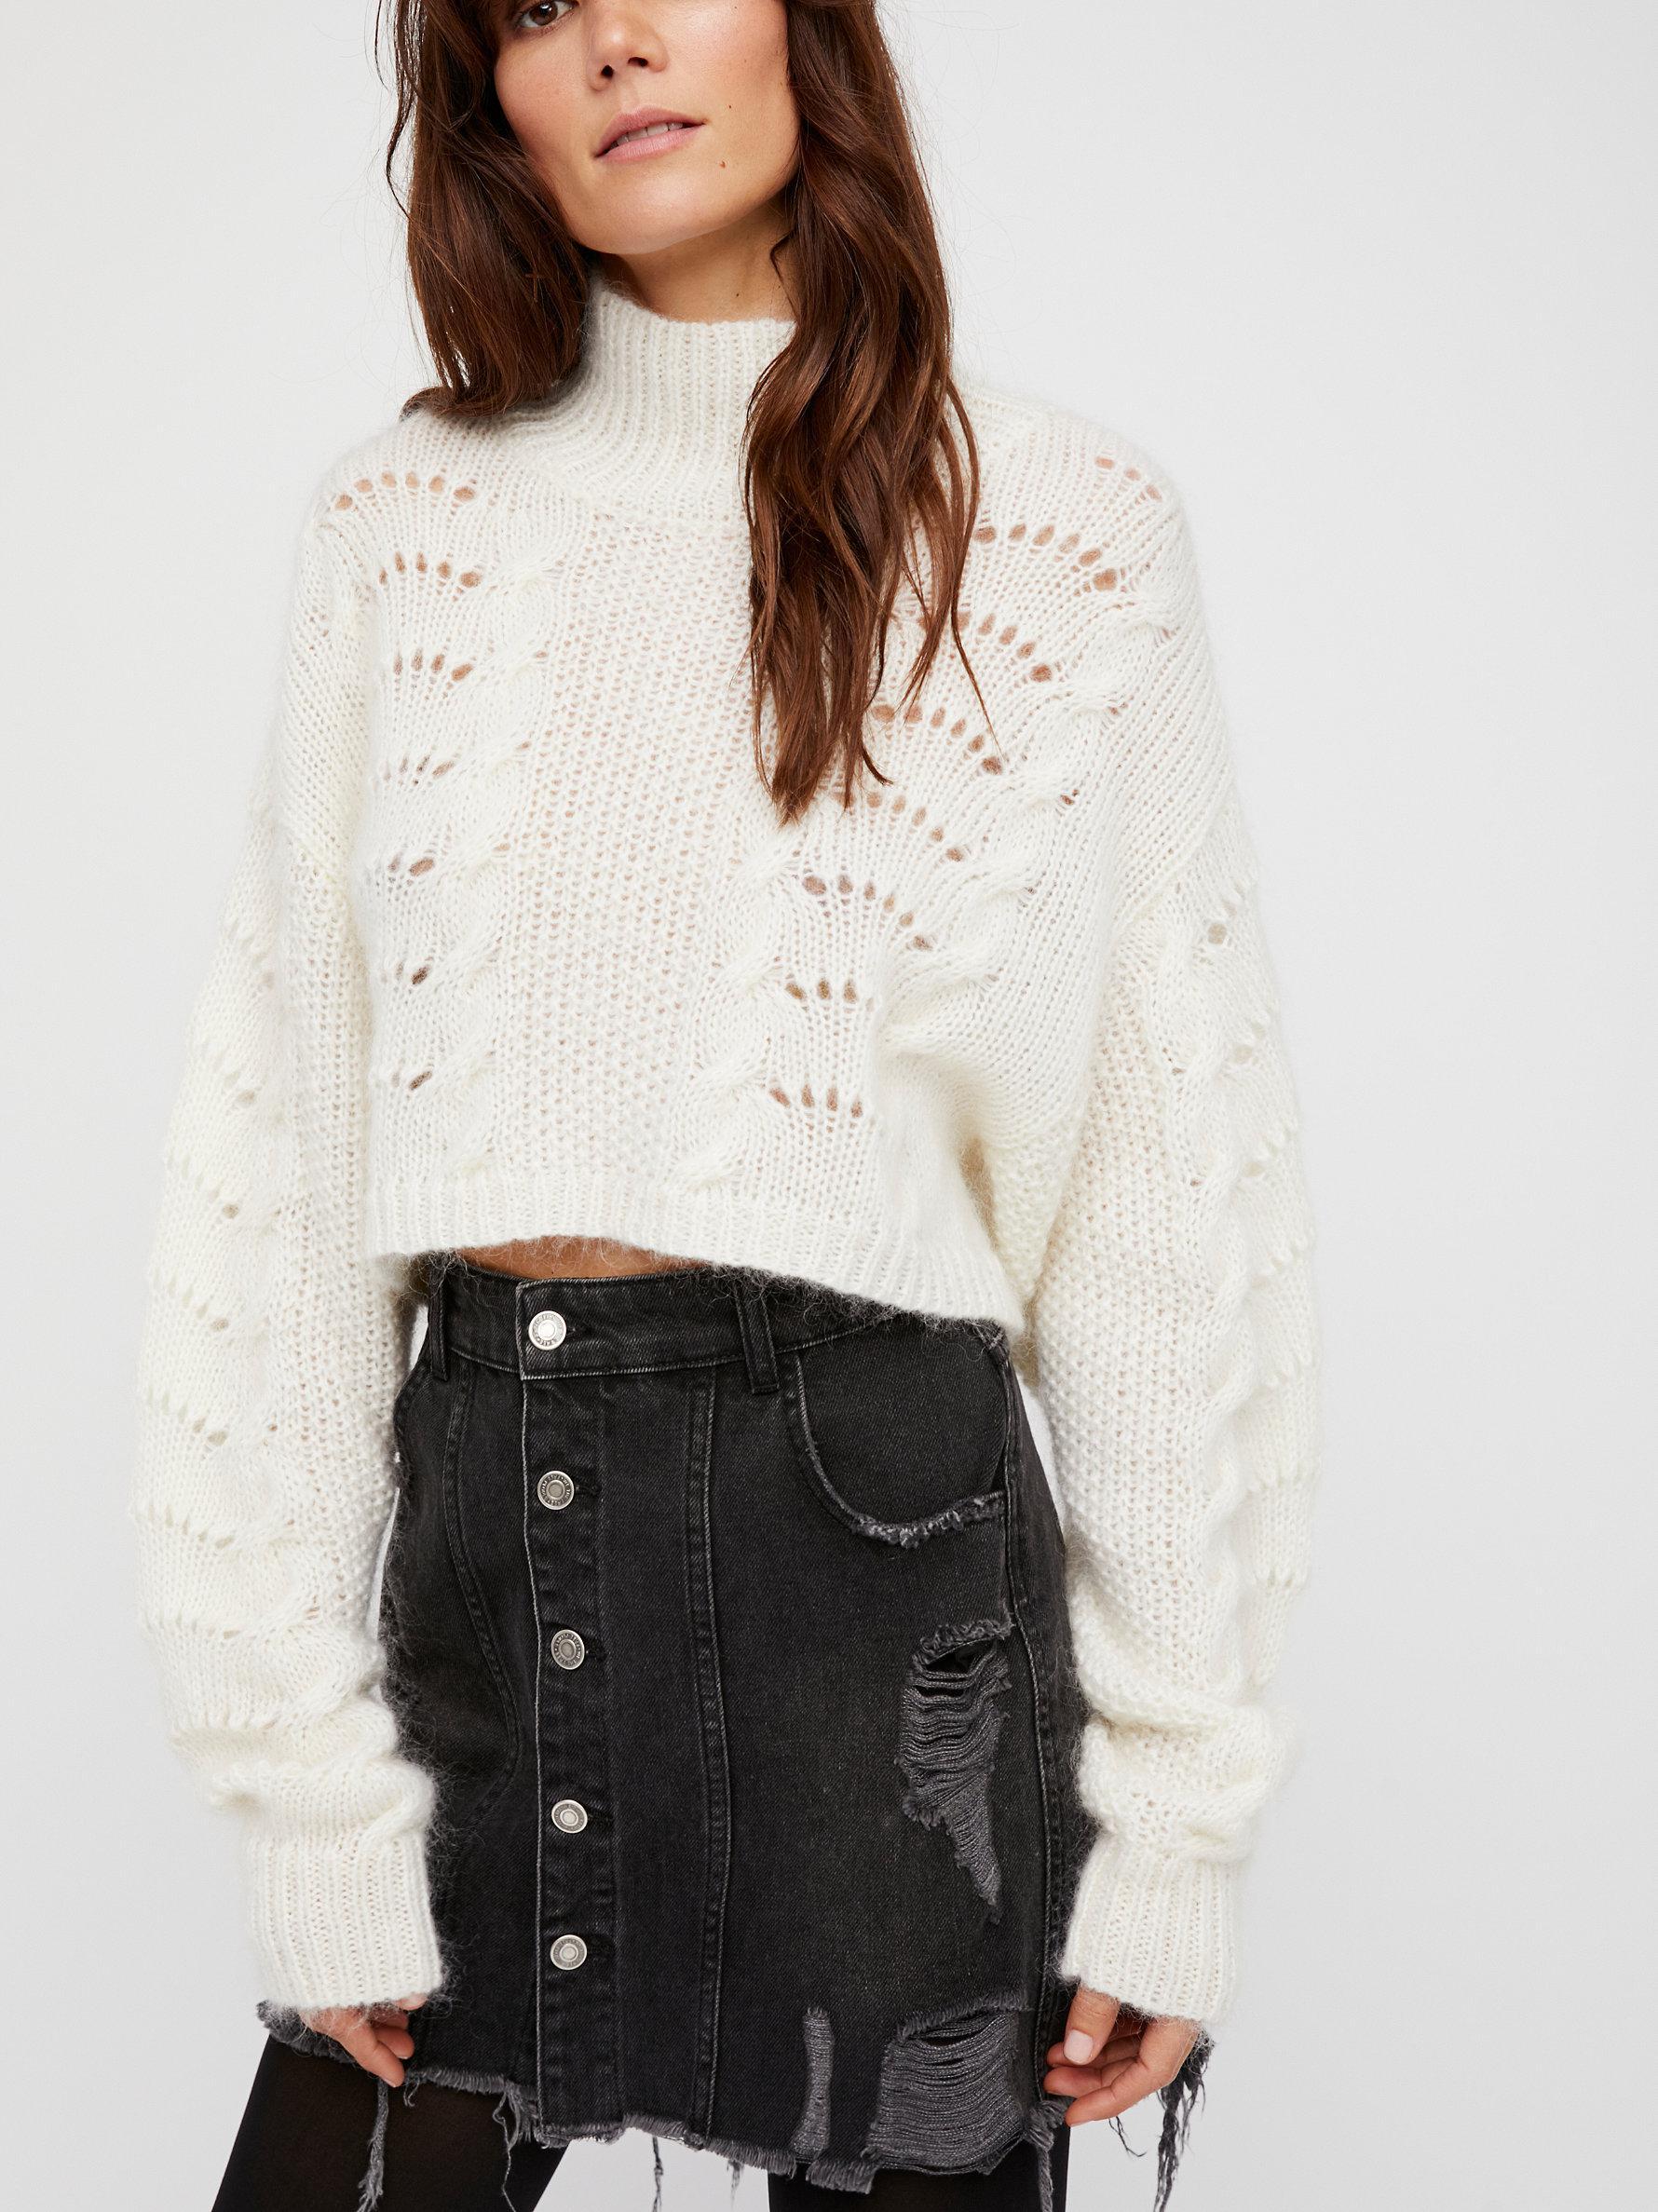 7fef4dba6968b Lyst - Free People Buttonfront Denim Mini Skirt in Black